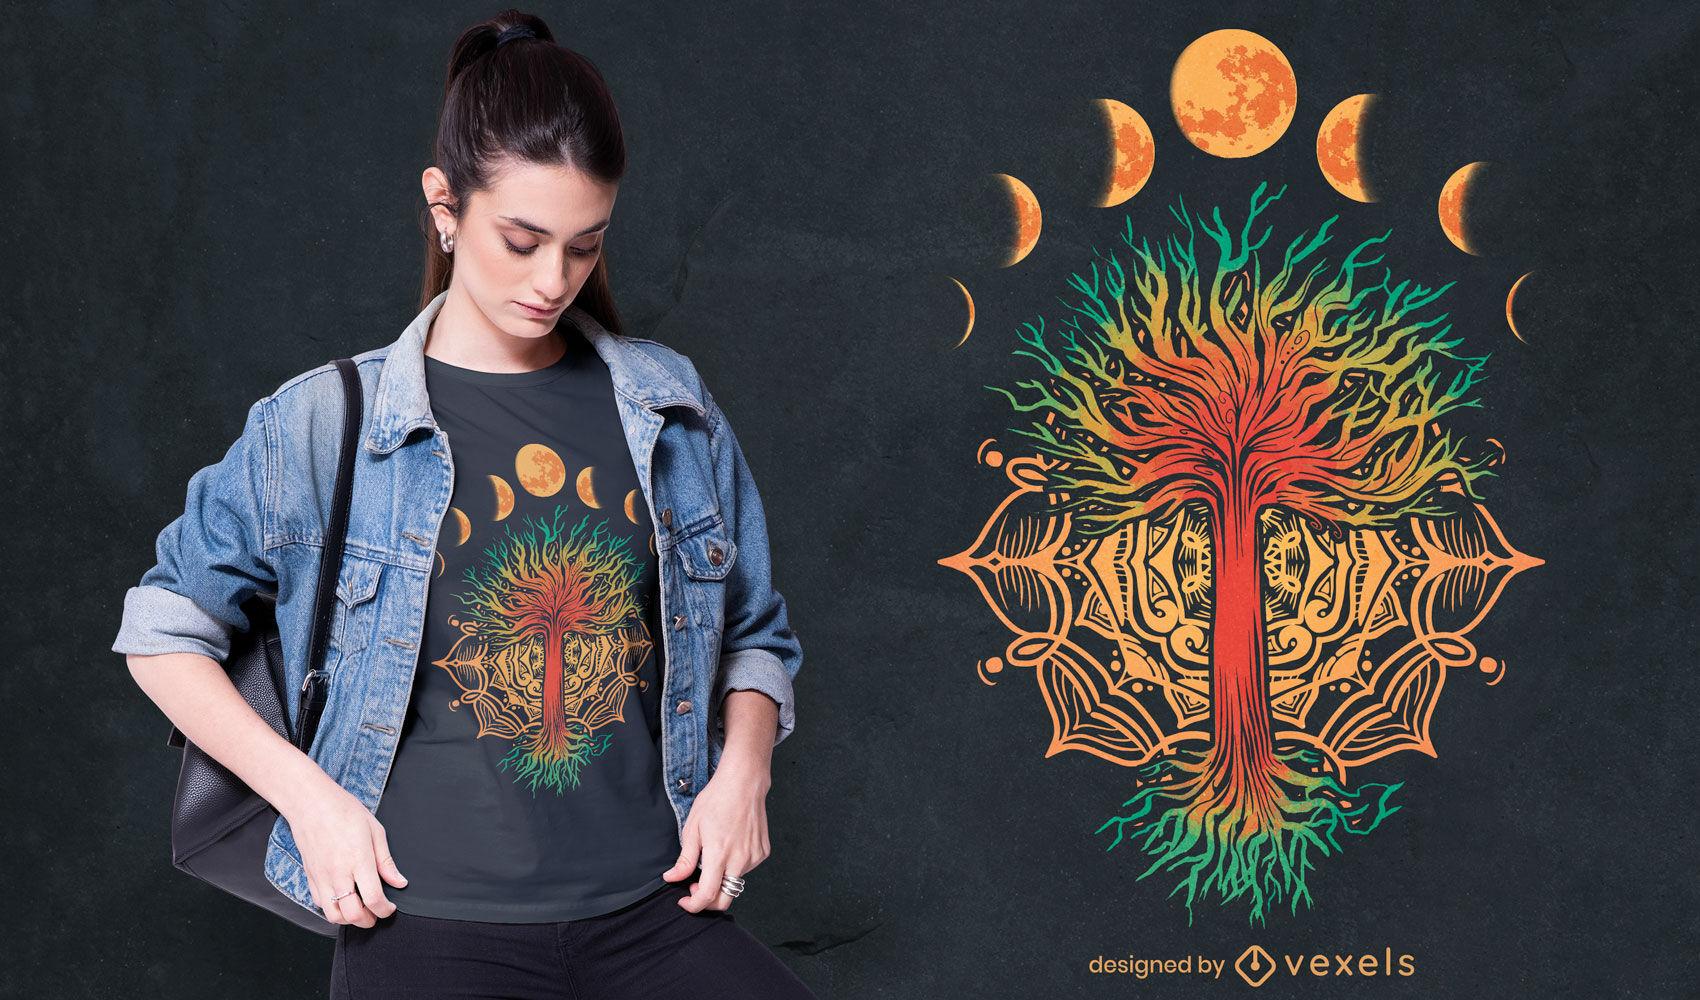 Diseño de camiseta de la naturaleza de la mandala de las fases de la luna.